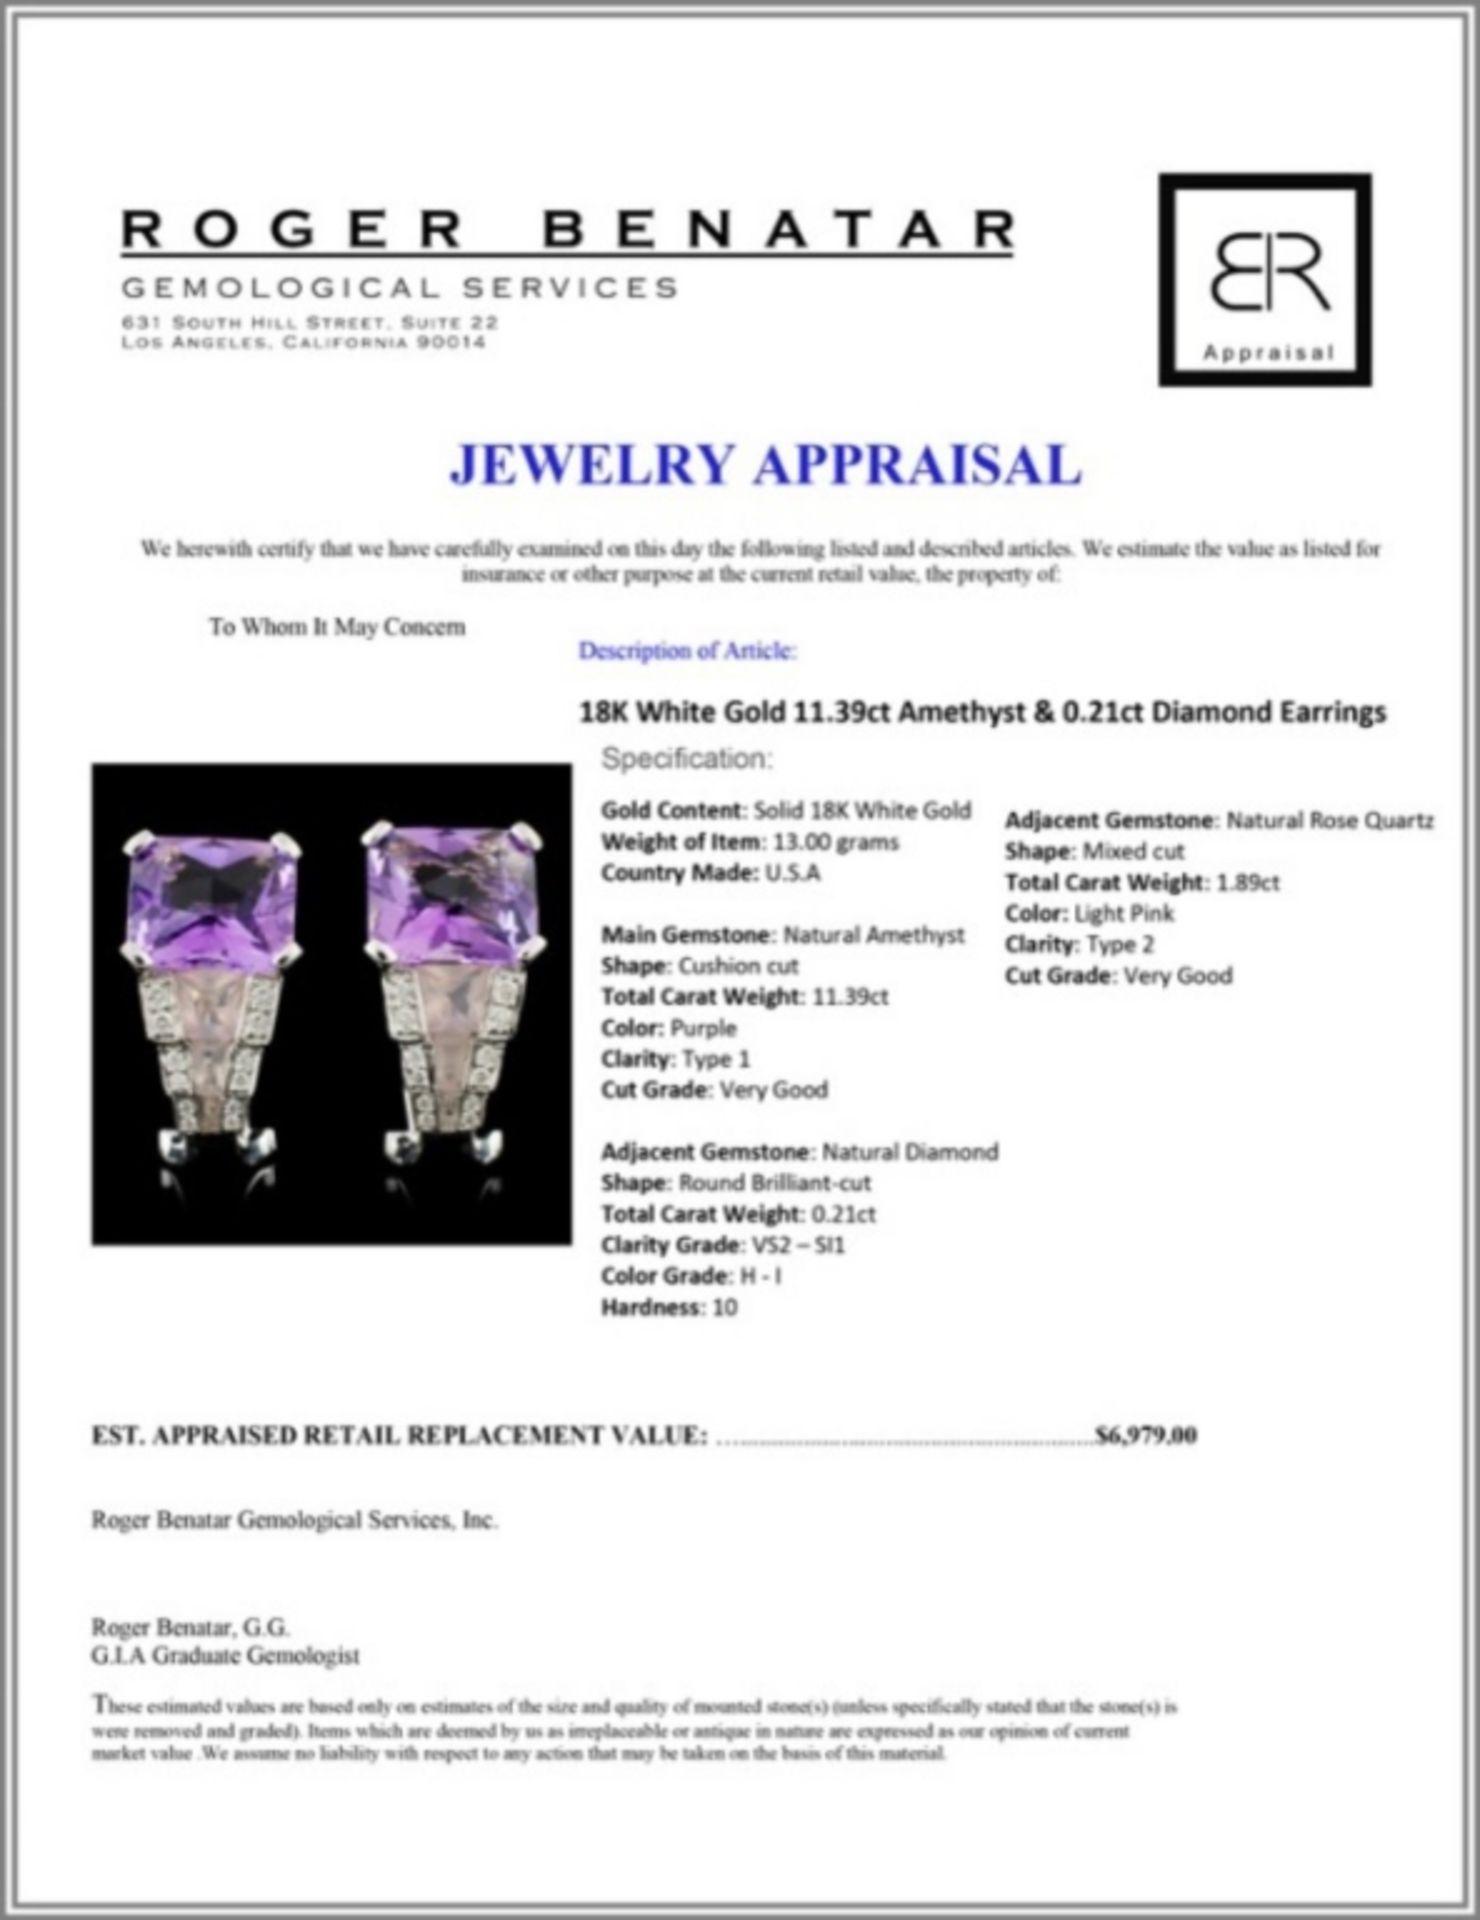 18K White Gold 11.39ct Amethyst & 0.21ct Diamond E - Image 3 of 3